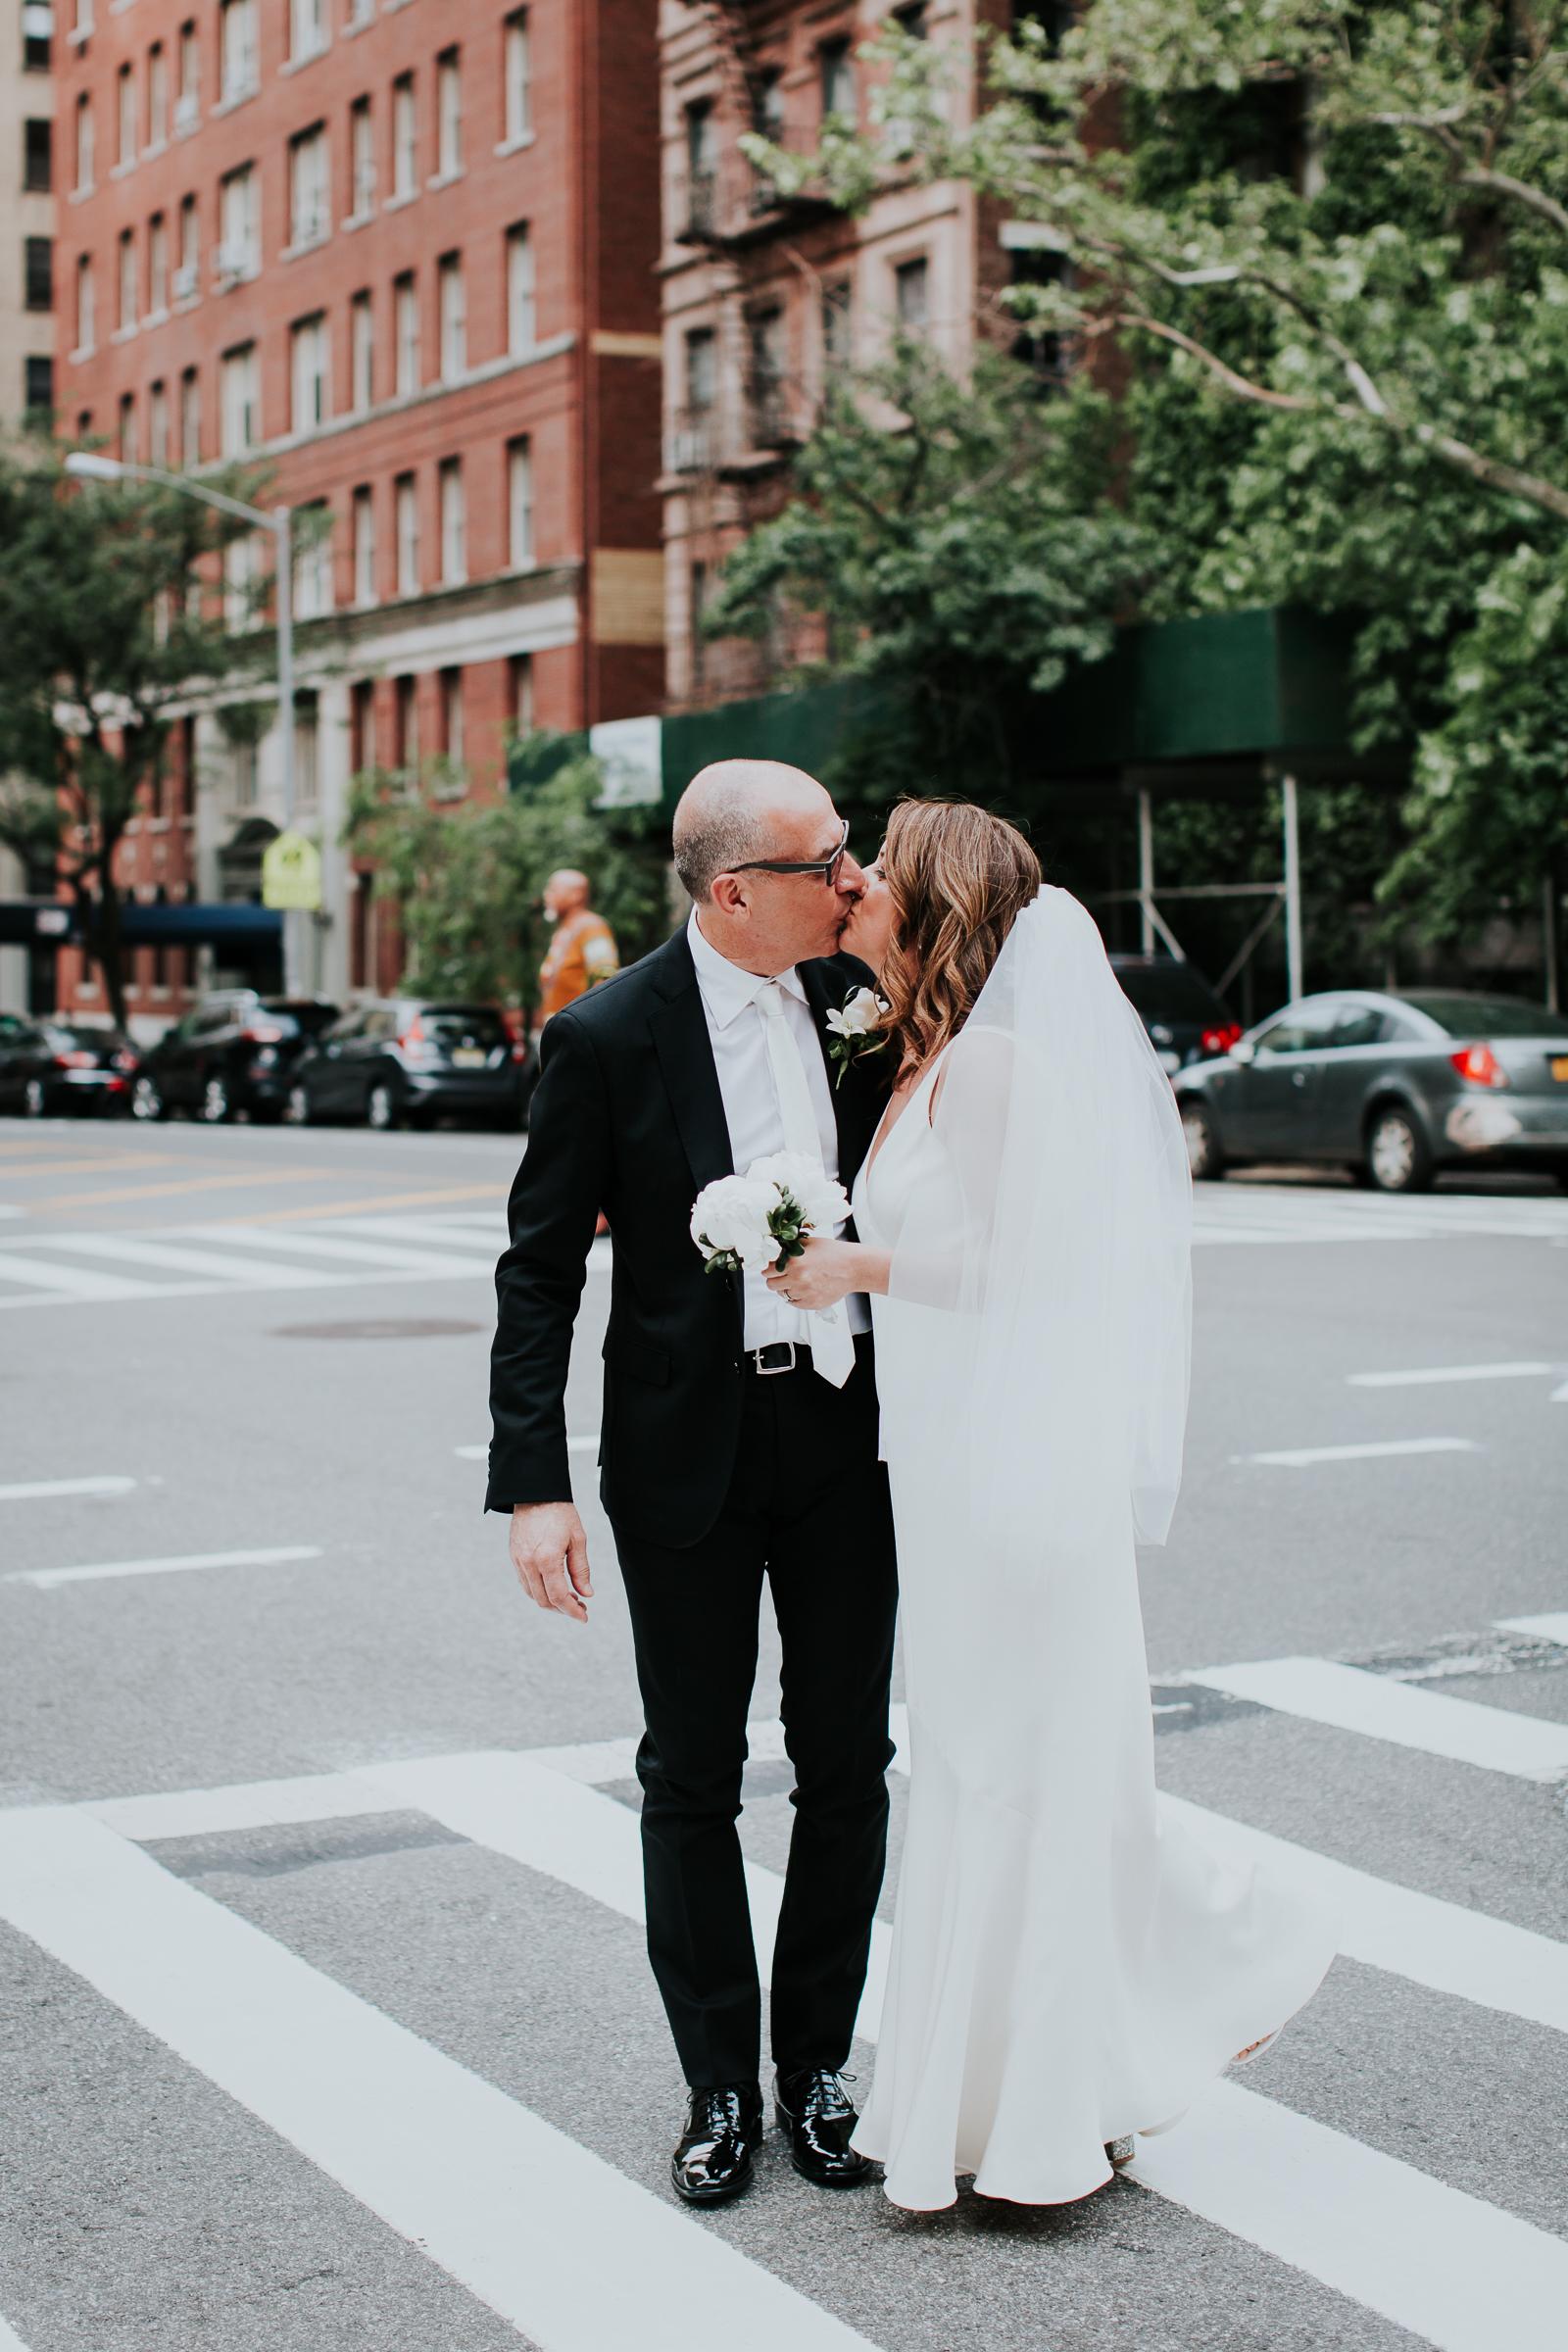 Robert-NYC-Museum-Of-Arts-&-Design-Greek-Italian-New-York-Documentary-Wedding-Photographer-30.jpg